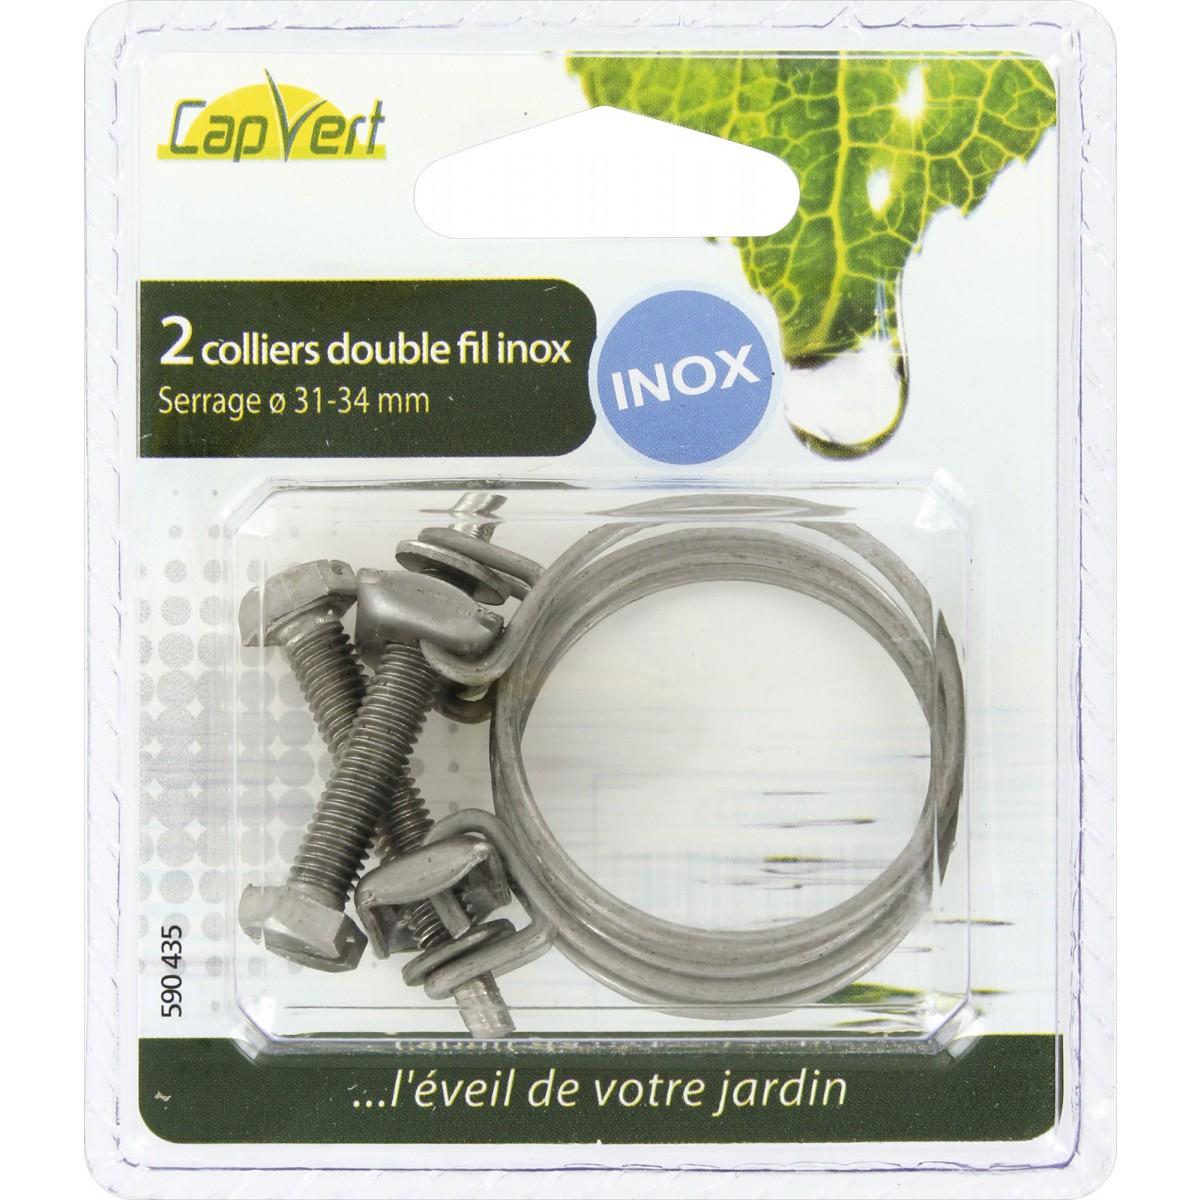 Collier double-fil inox Cap Vert - Diamètre 31 - 34 mm - Vendu par 2